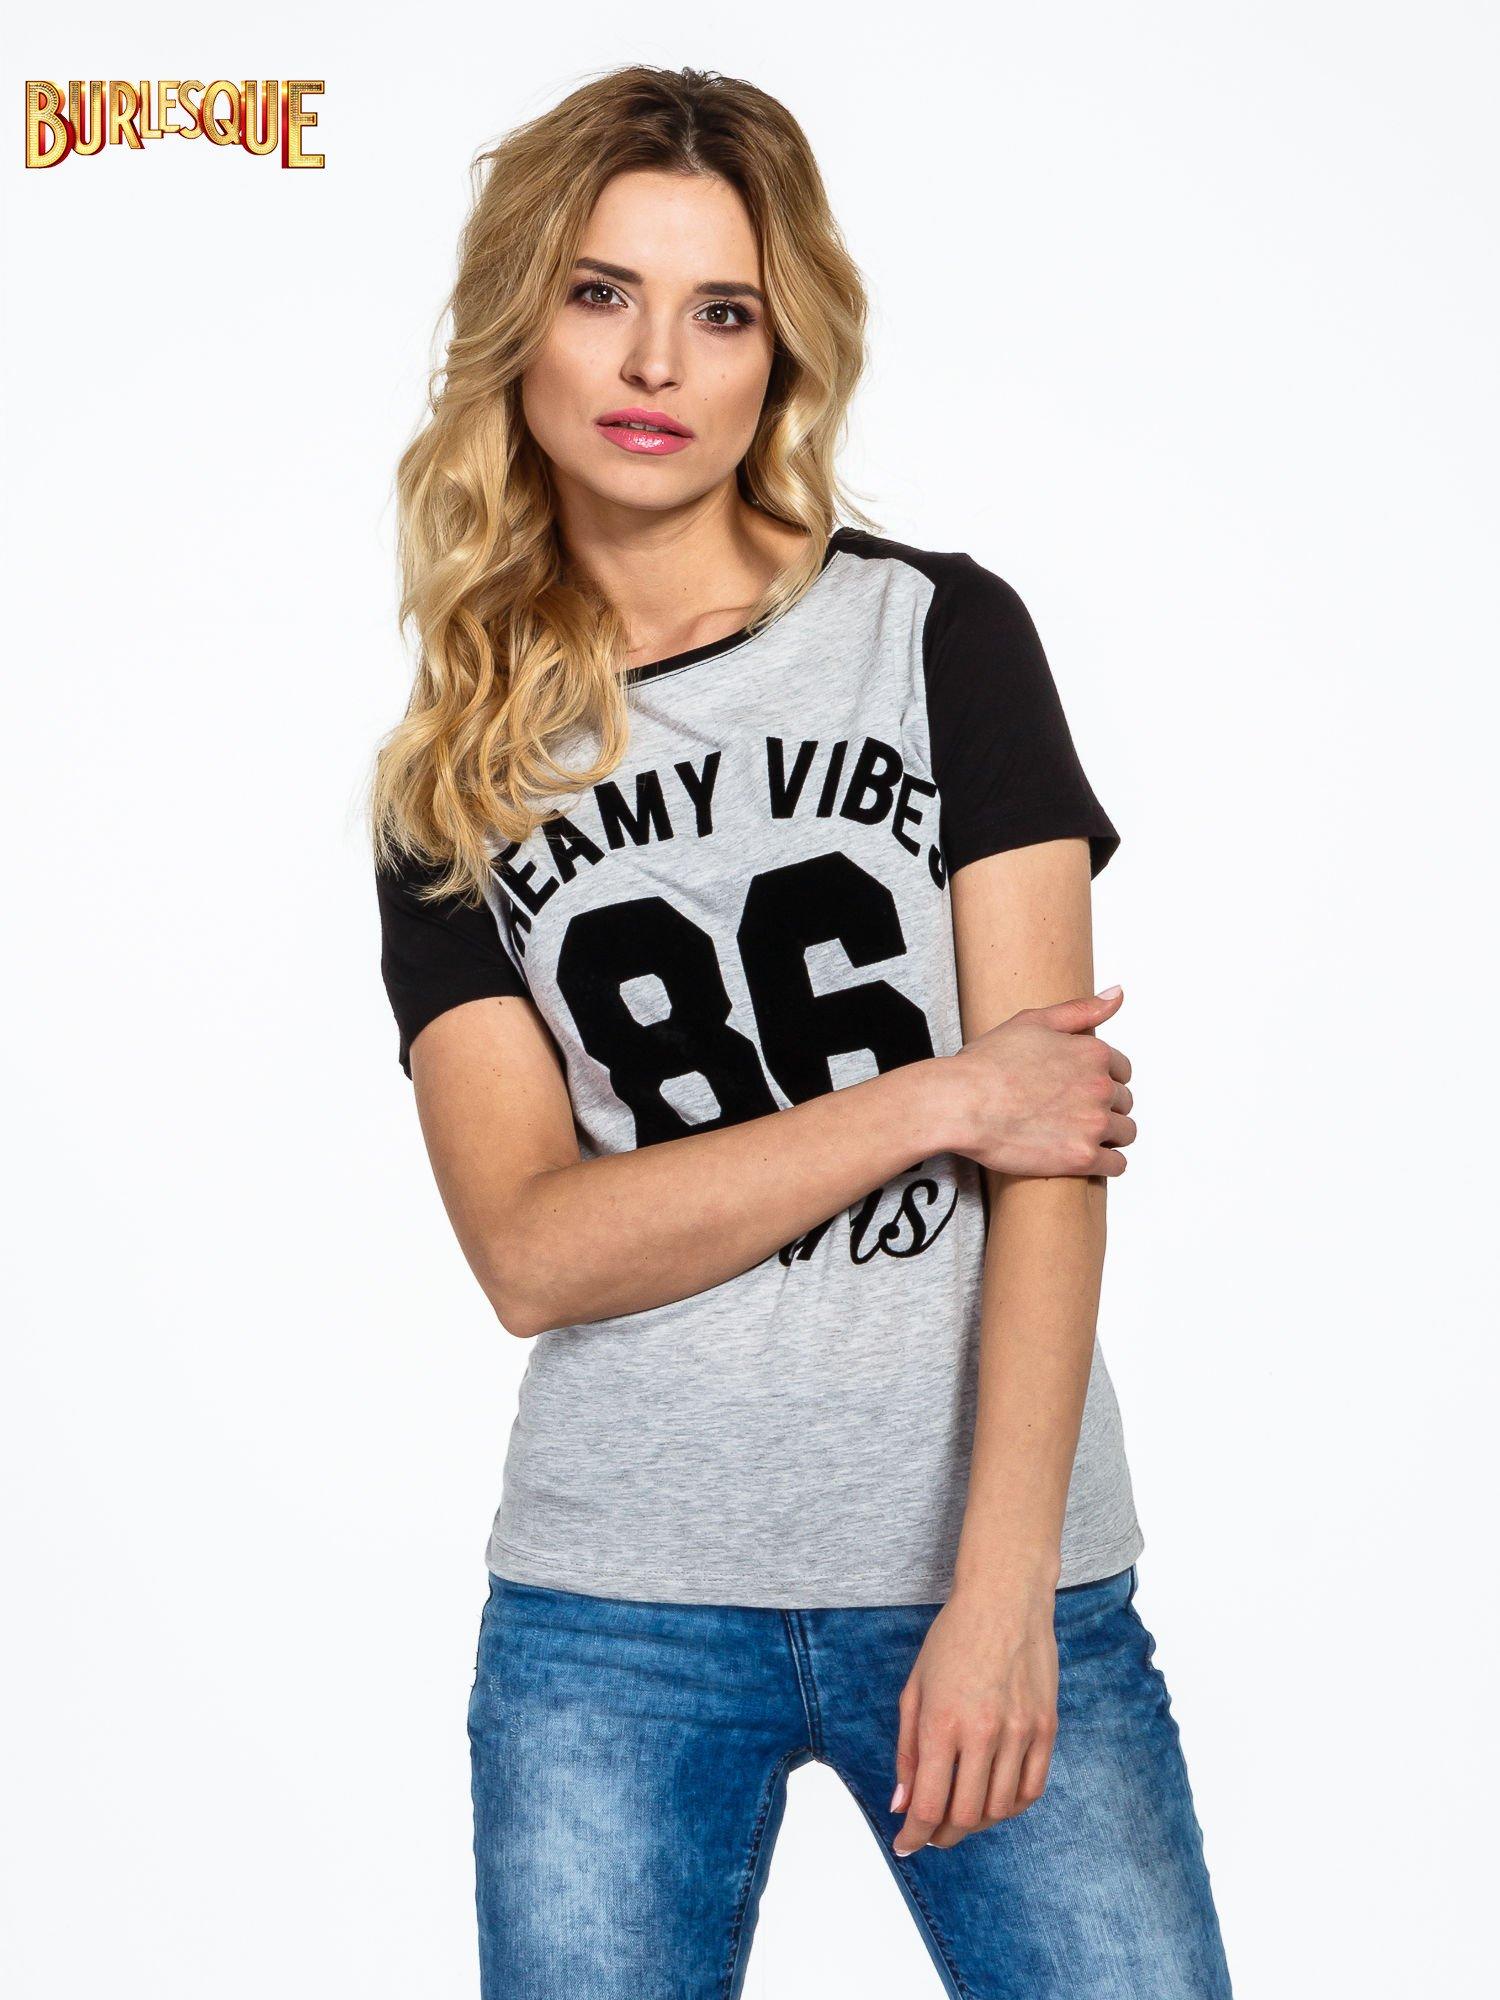 Ciemnoszaro-czarny t-shirt z napisem DREAMY VIBES 86 PARIS                                  zdj.                                  1